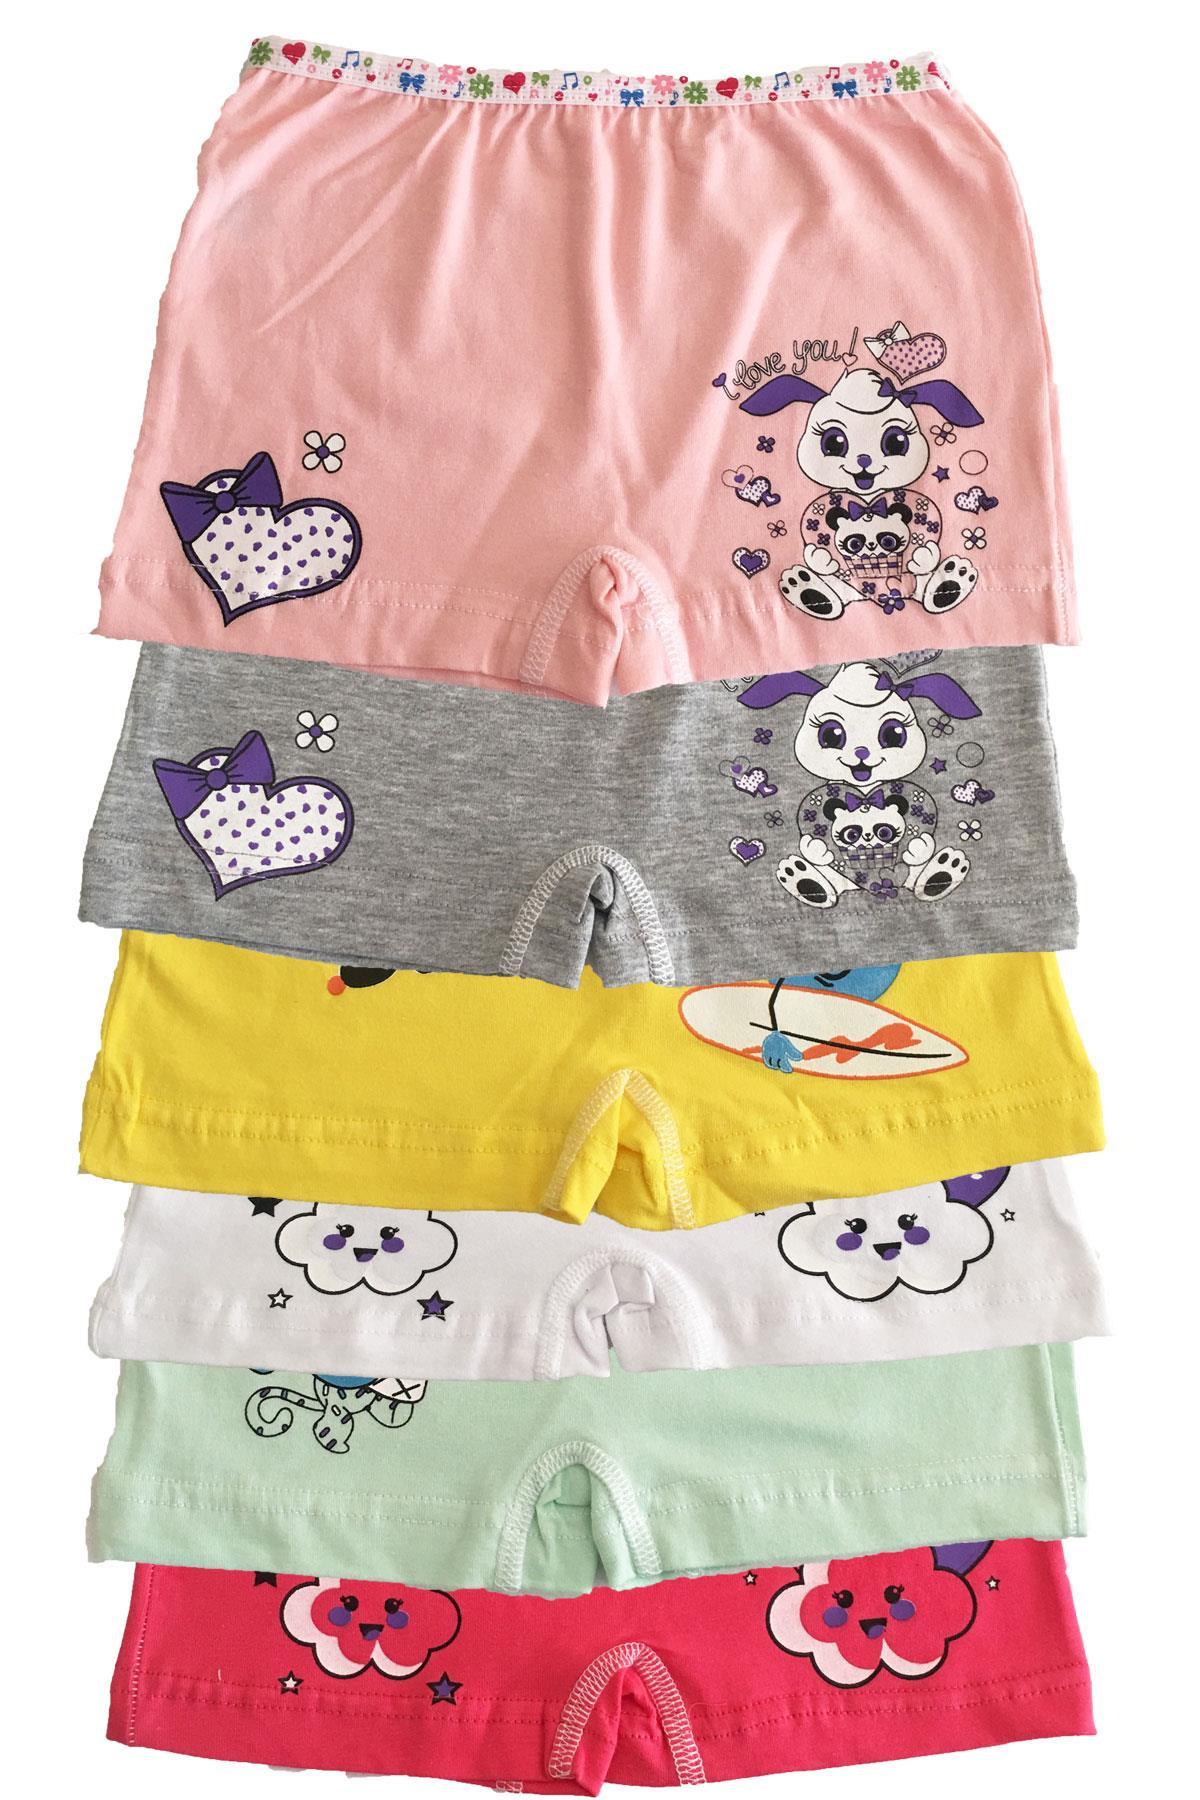 Tutku İç Giyim Kız Çocuk Renkli Likralı Pamuk Boxer Külot 6 lı Paket